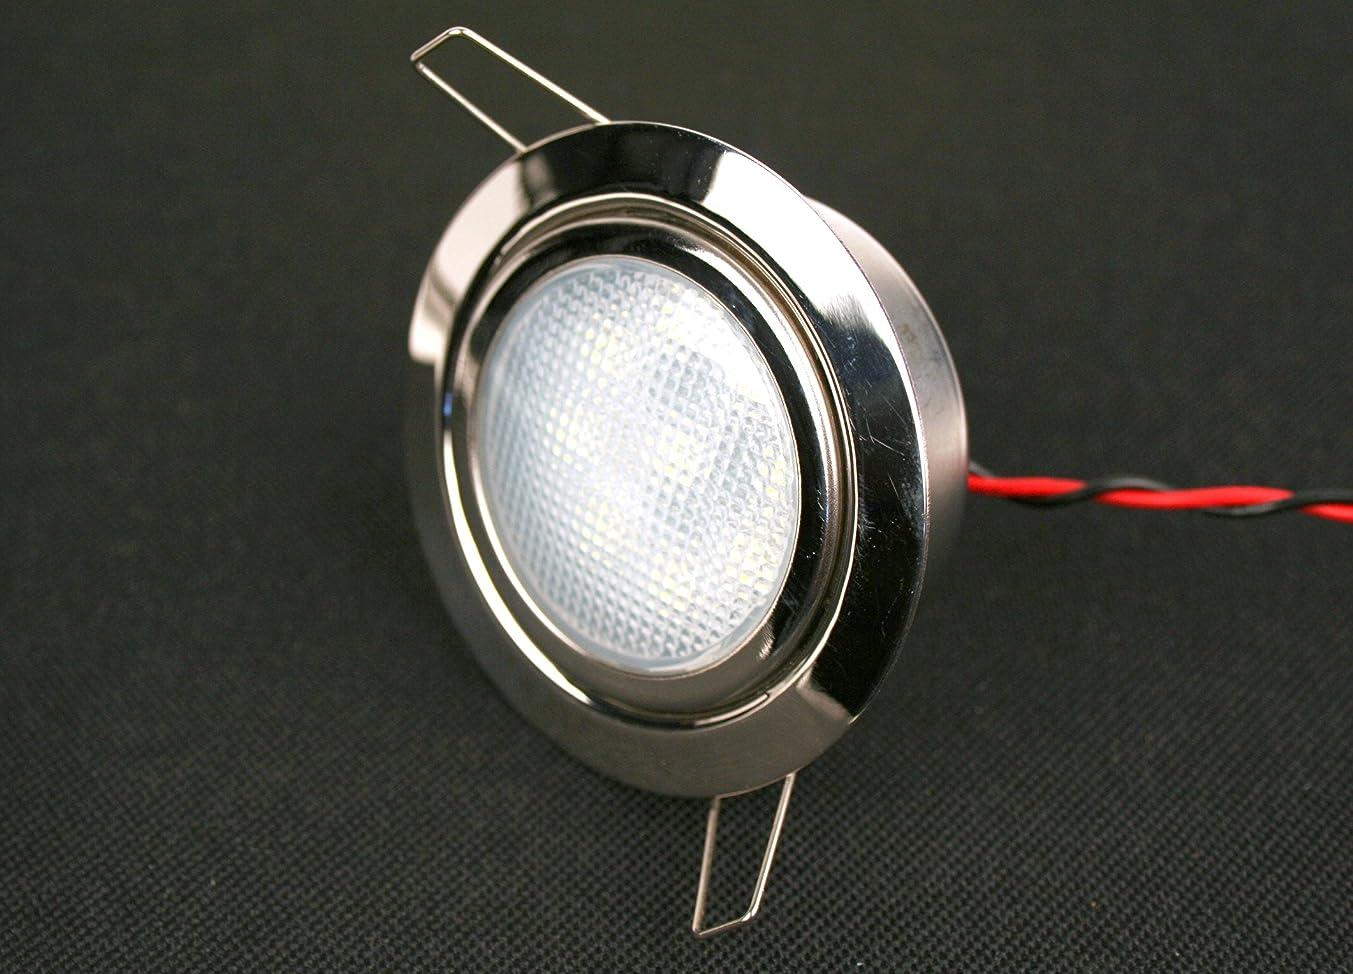 LED Dome Light - High Power 2.3